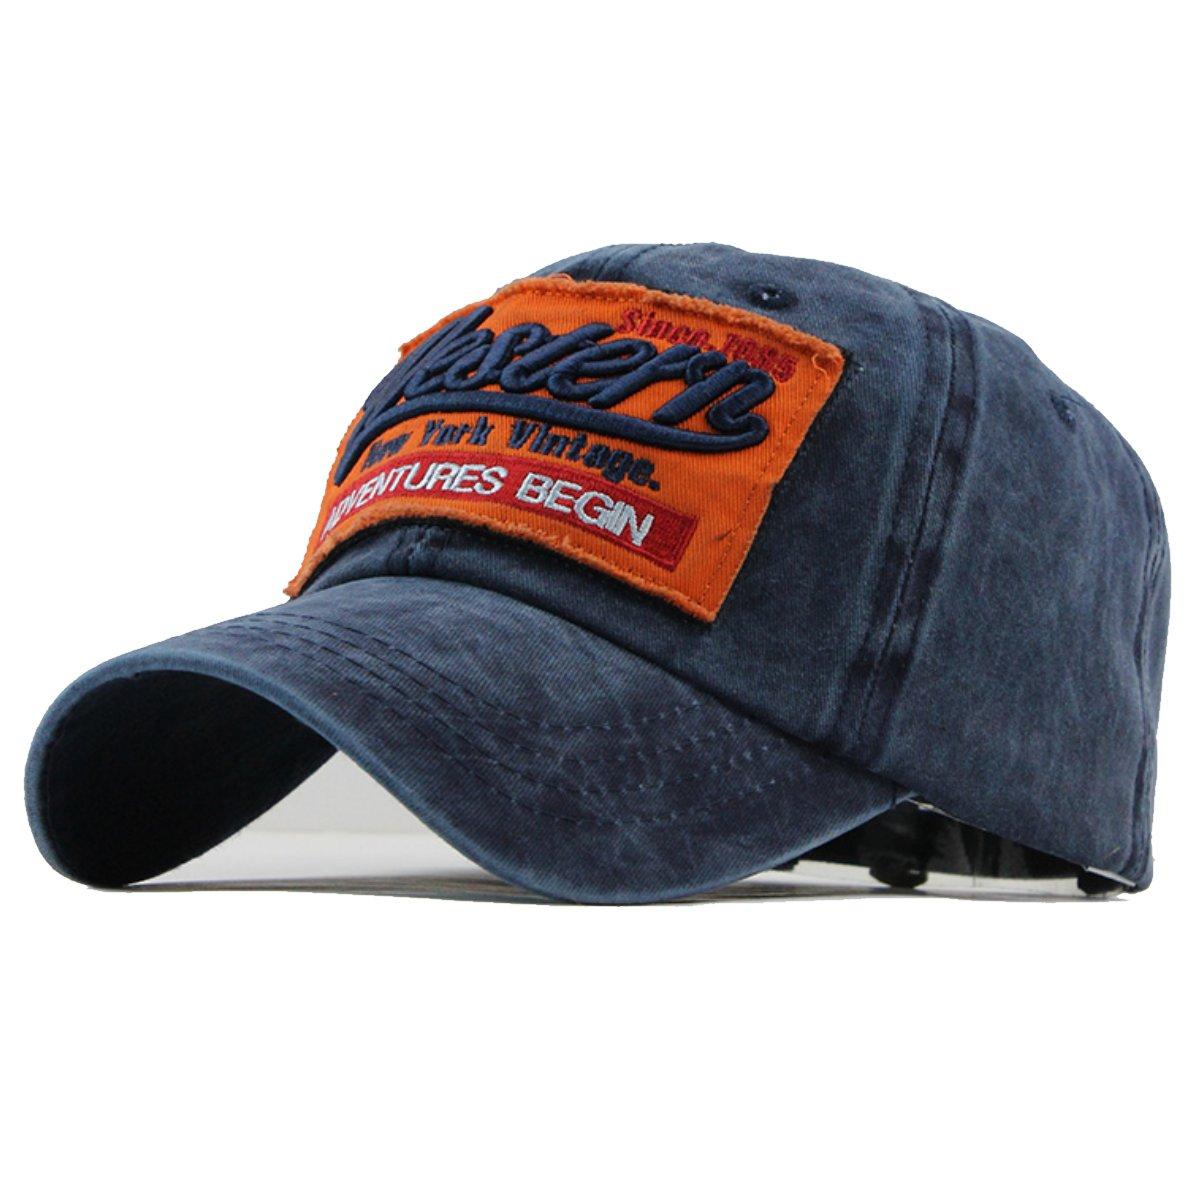 Sporty Trucker Baseballcap Western New York Cotton Distressed Snapback Vintage Cap